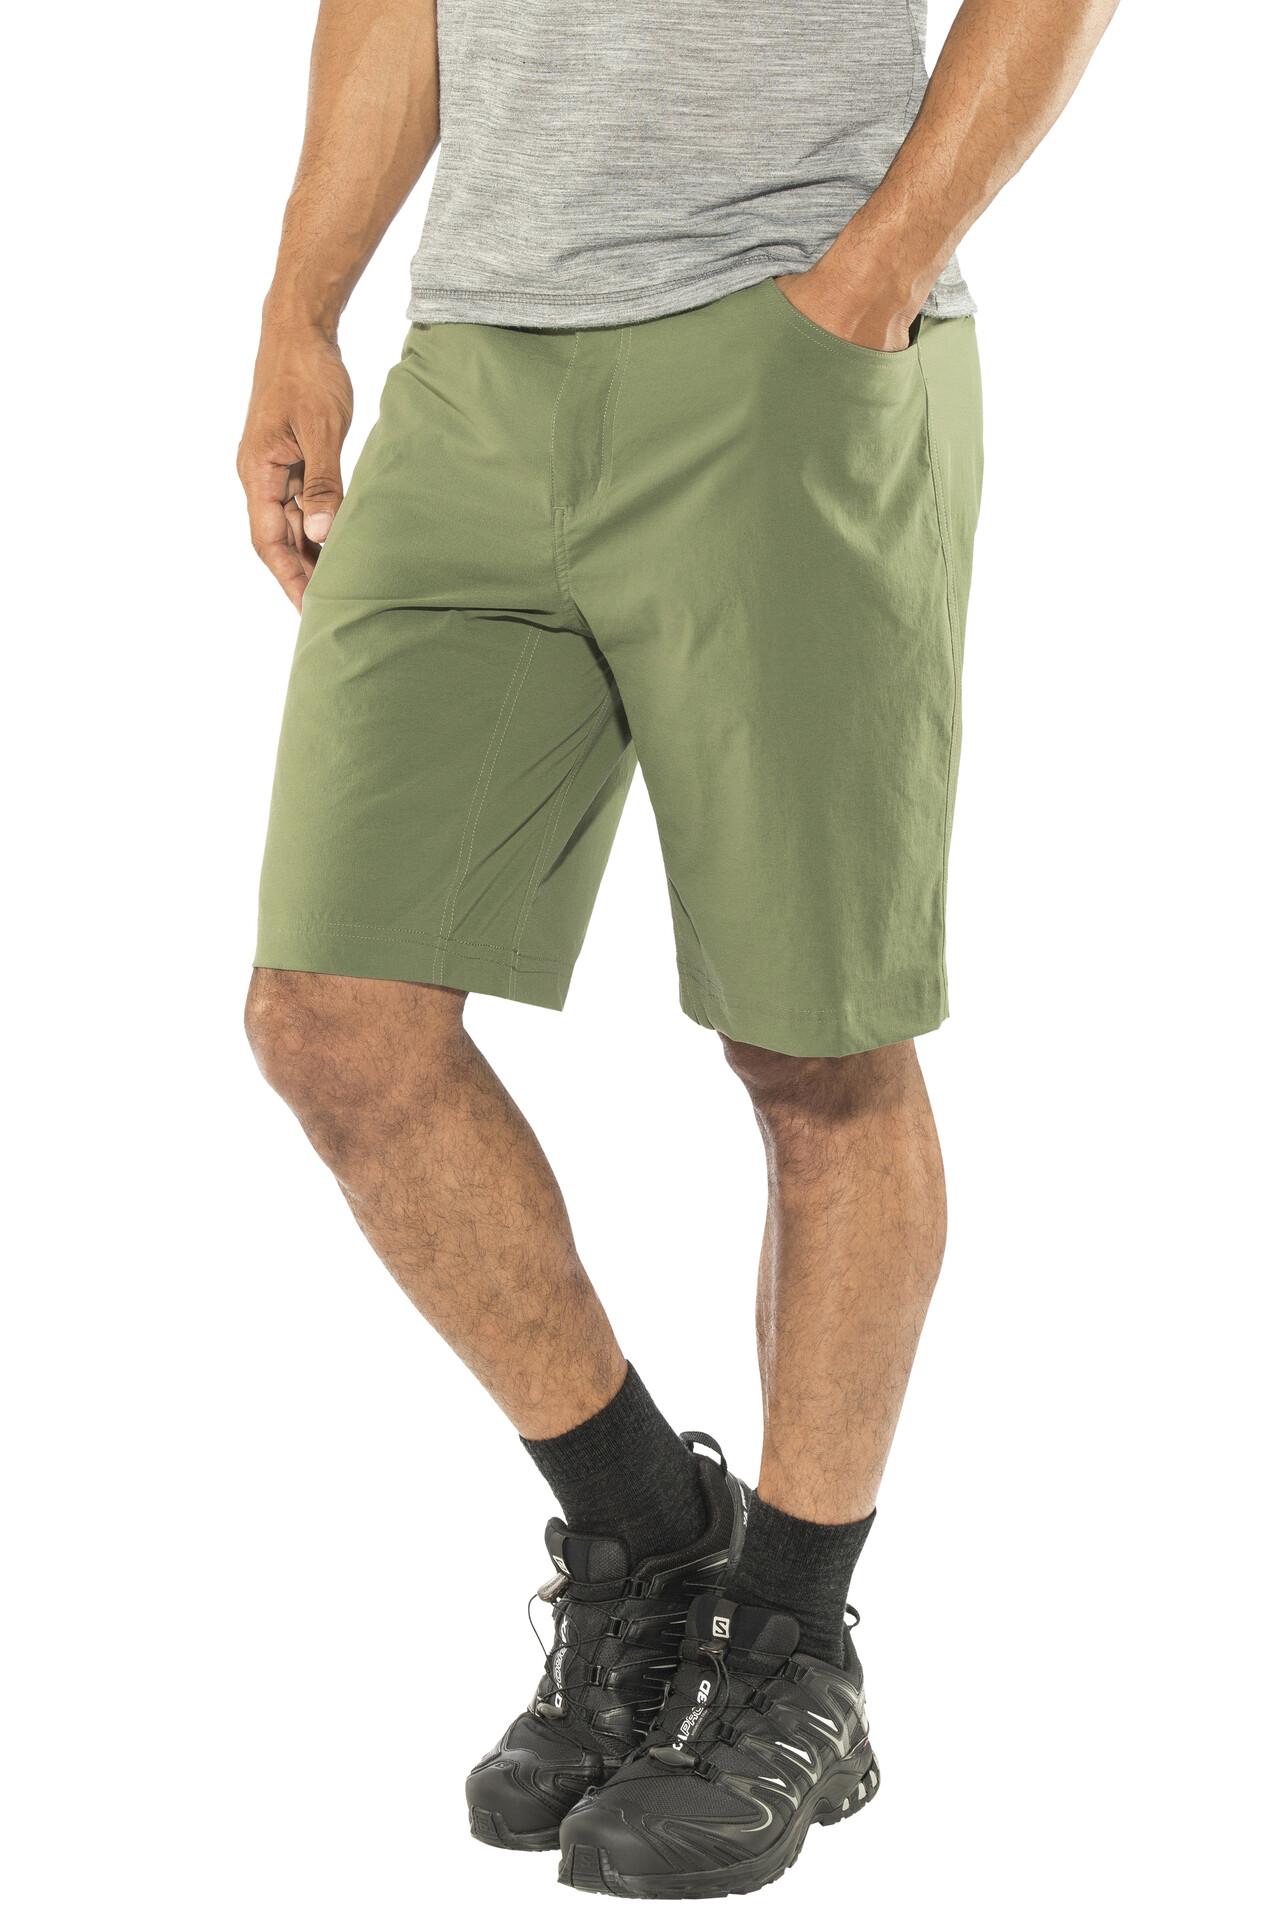 olive Marmot Syncline Shorts Homme Shorts Syncline Marmot Homme 60C0dnxR